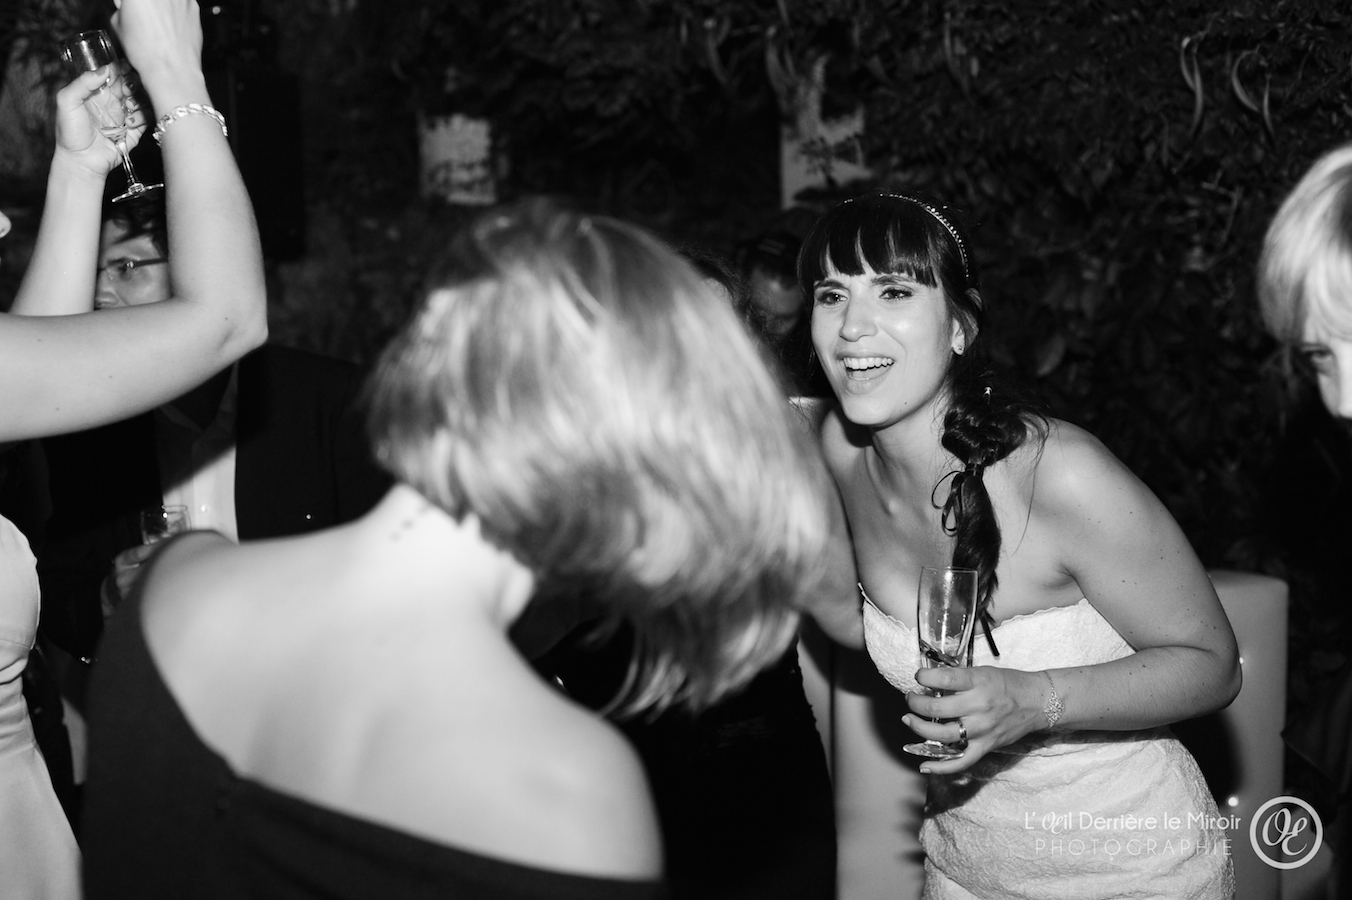 Photographe-Fayence-loeilderrierelemiroir-057